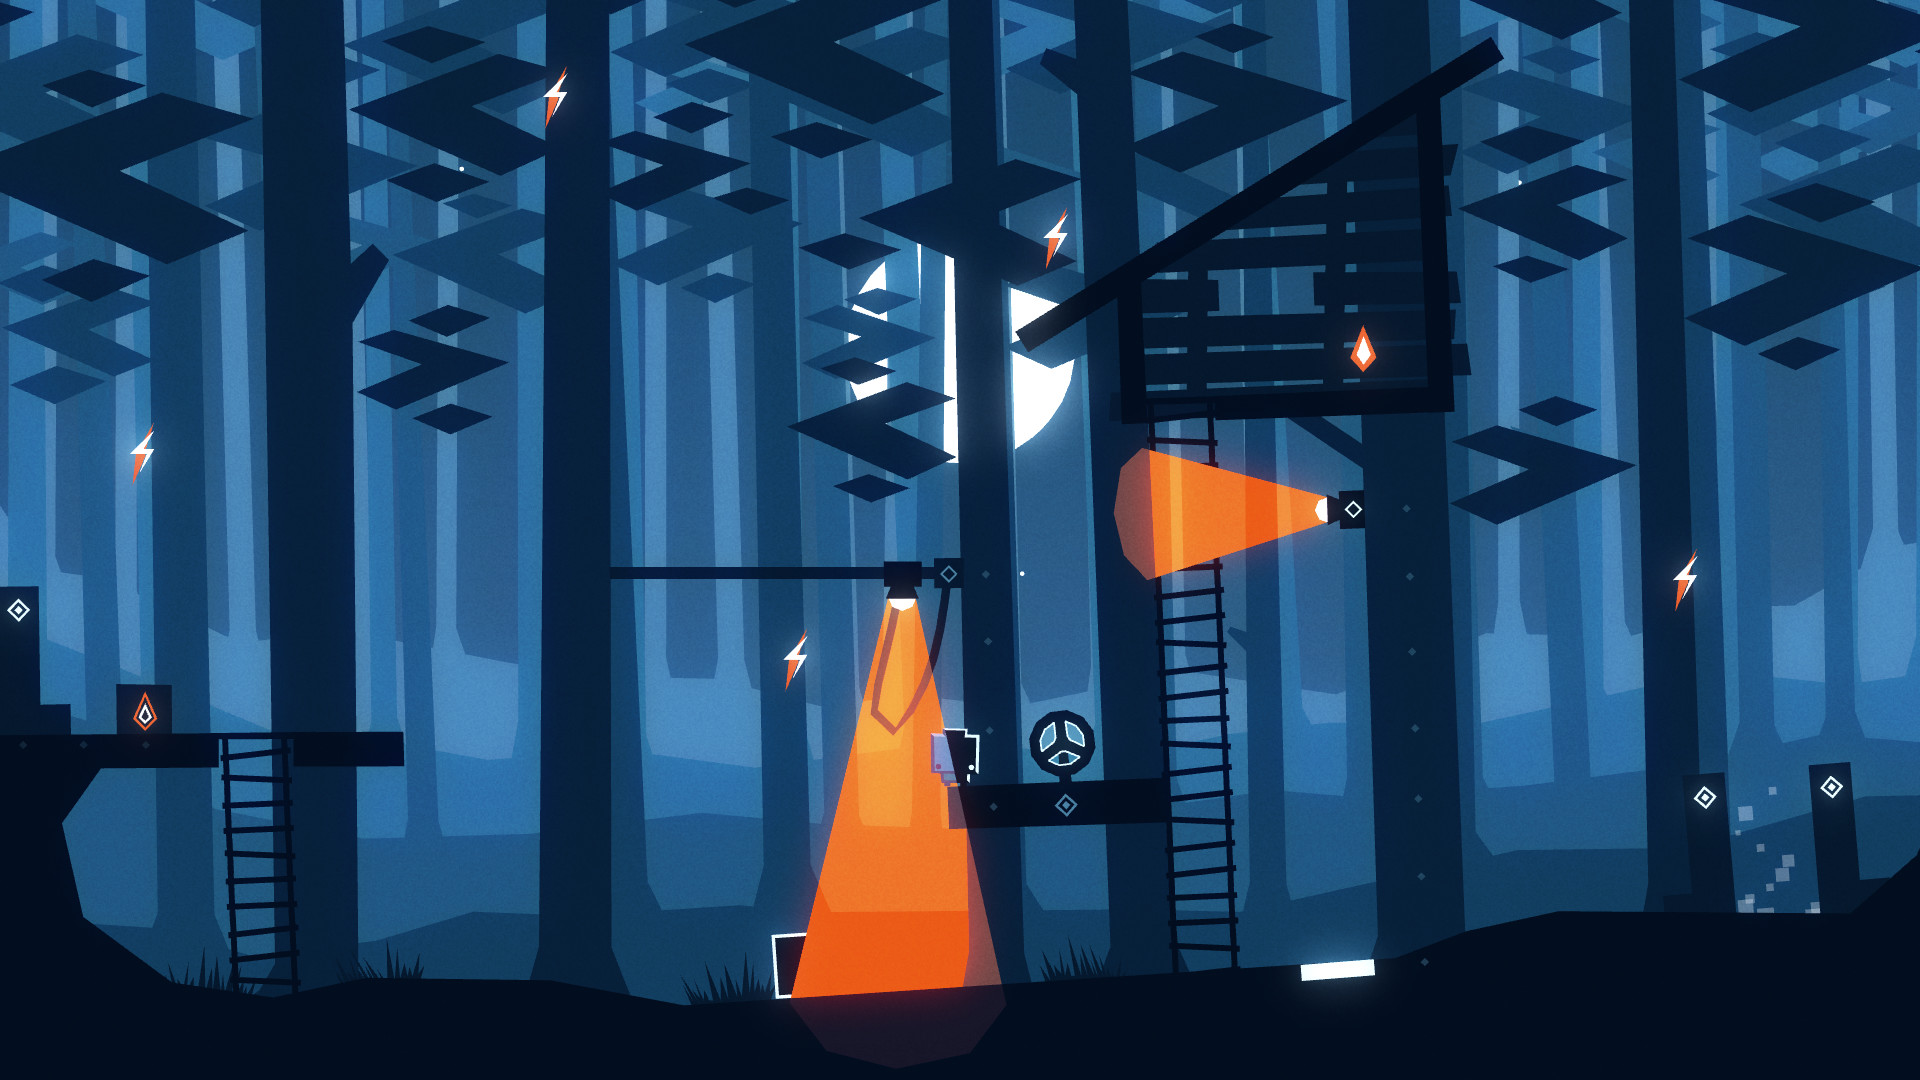 Night Lights screenshot